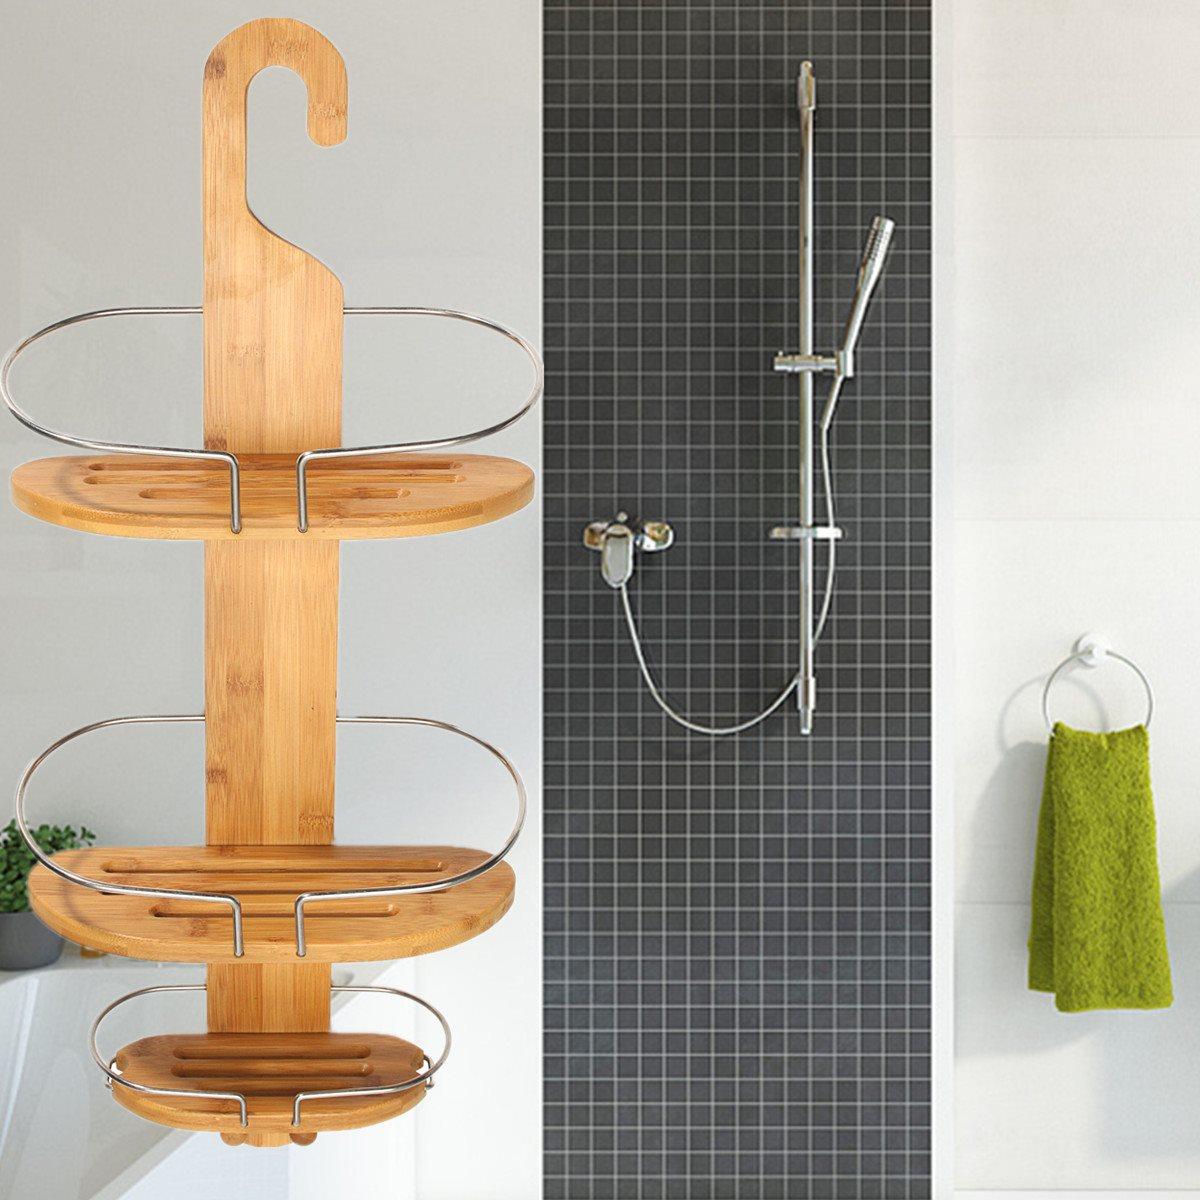 Badkamer accessoires hout. gallery of best badkamerxxl accessoires